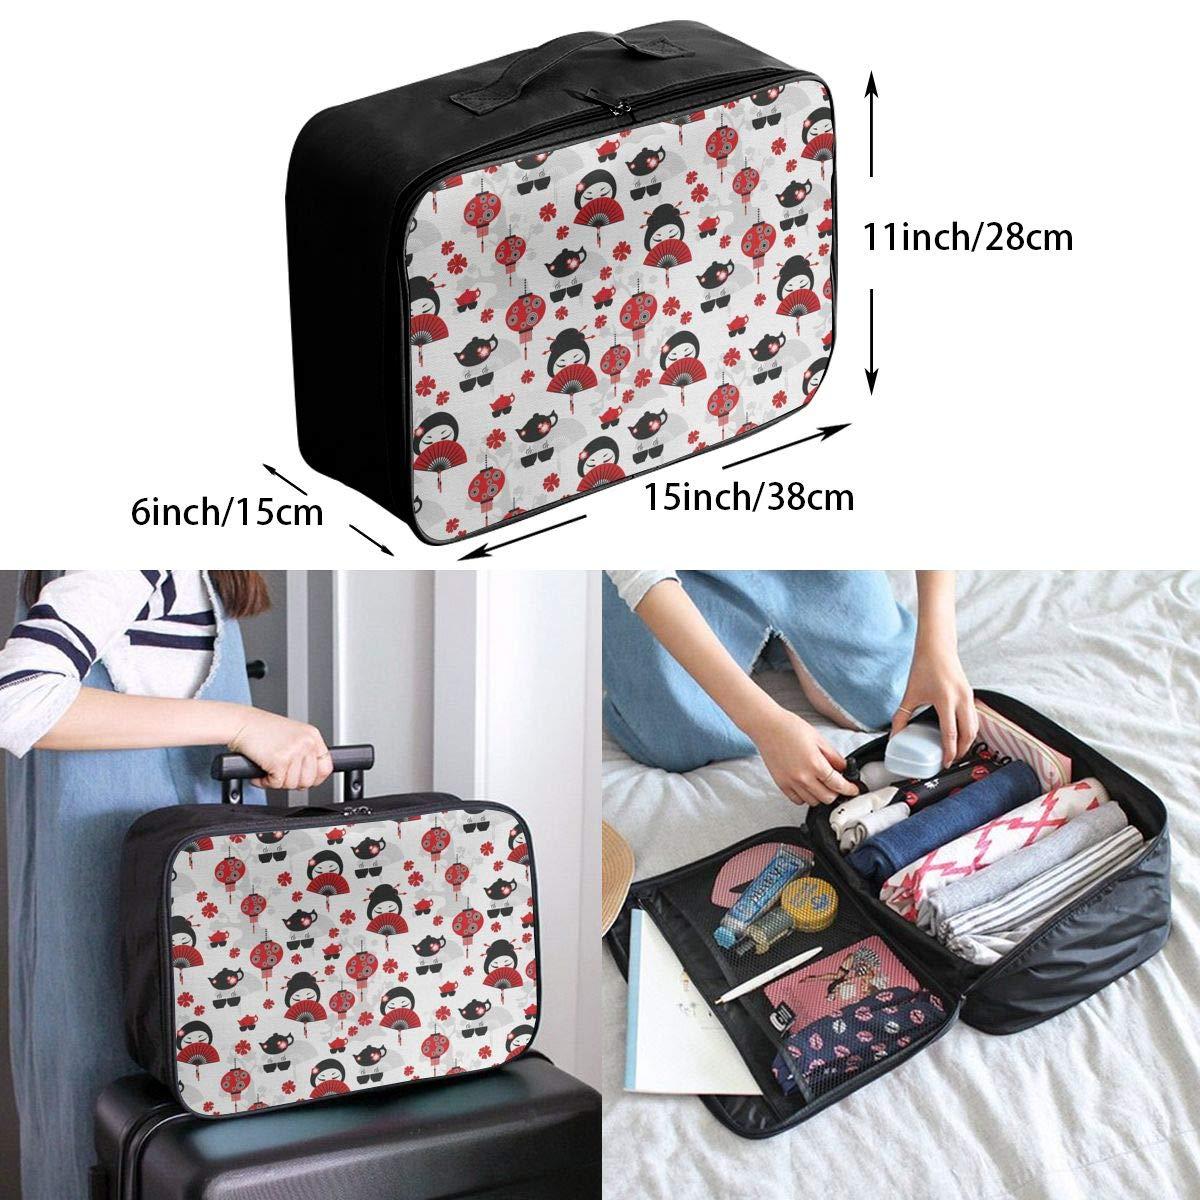 ADGAI Geisha with Japanese Fan Canvas Travel Weekender Bag,Fashion Custom Lightweight Large Capacity Portable Luggage Bag,Suitcase Trolley Bag